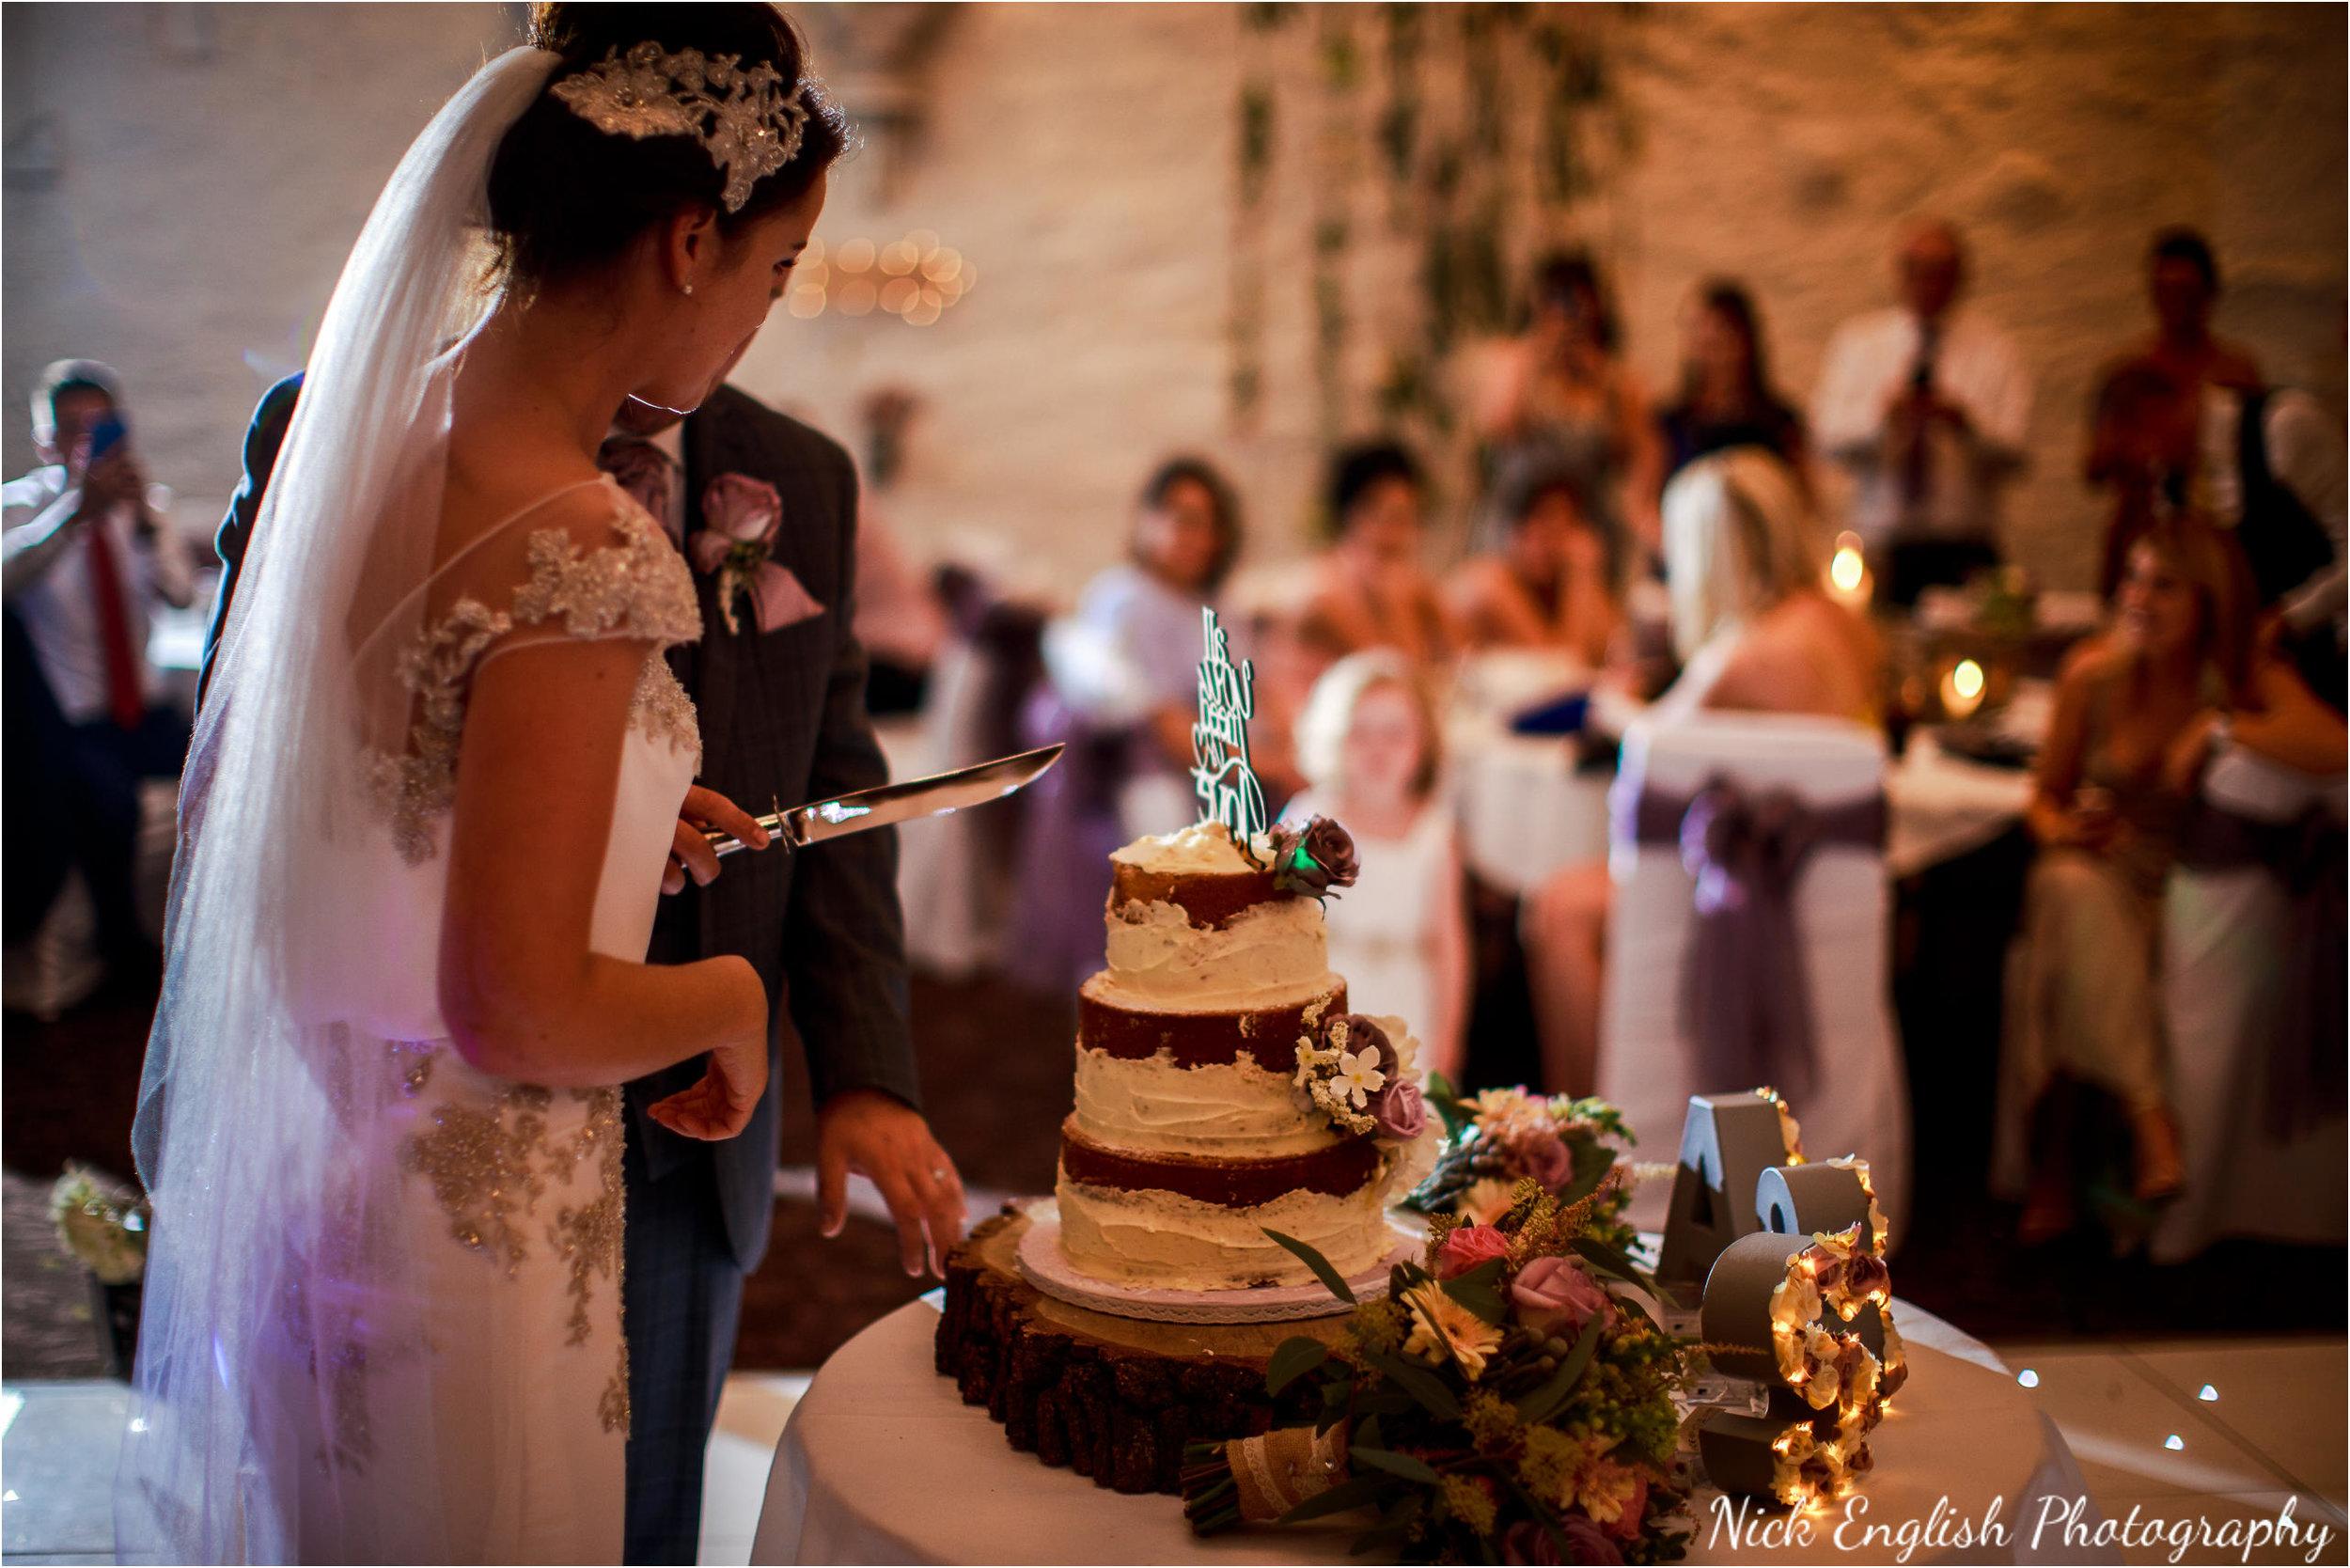 Stacey-Ash-Wedding-Photographs-Stanley-House-Preston-Lancashire-239.jpg